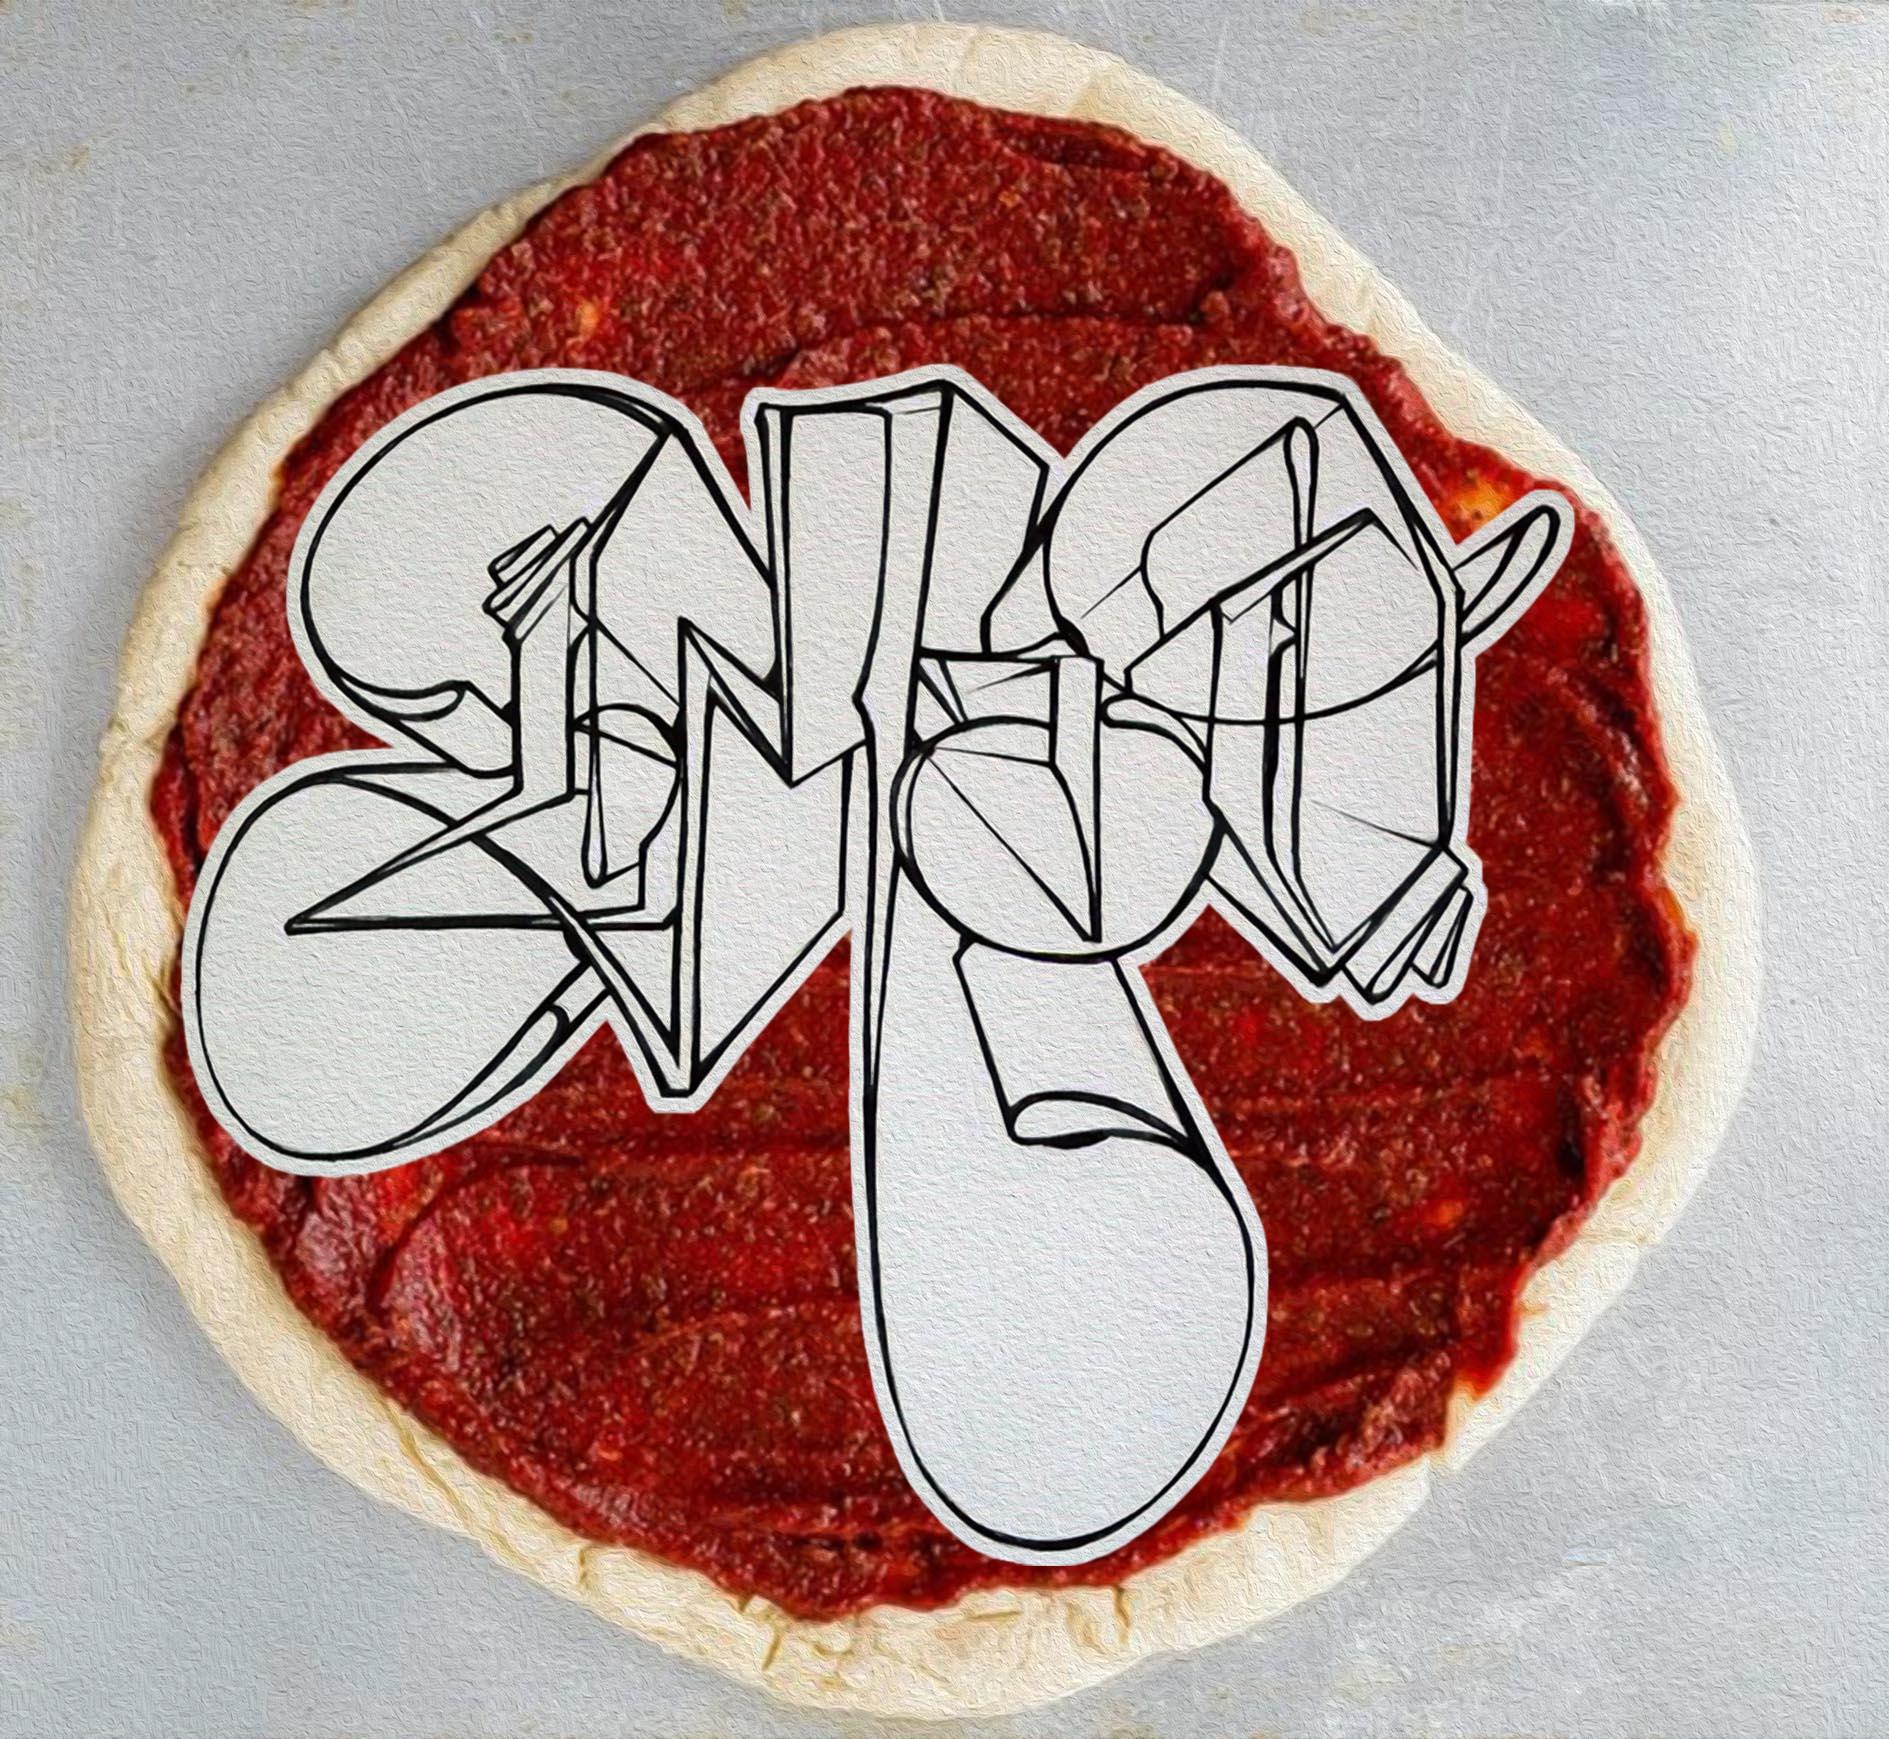 graffpizza2.jpg